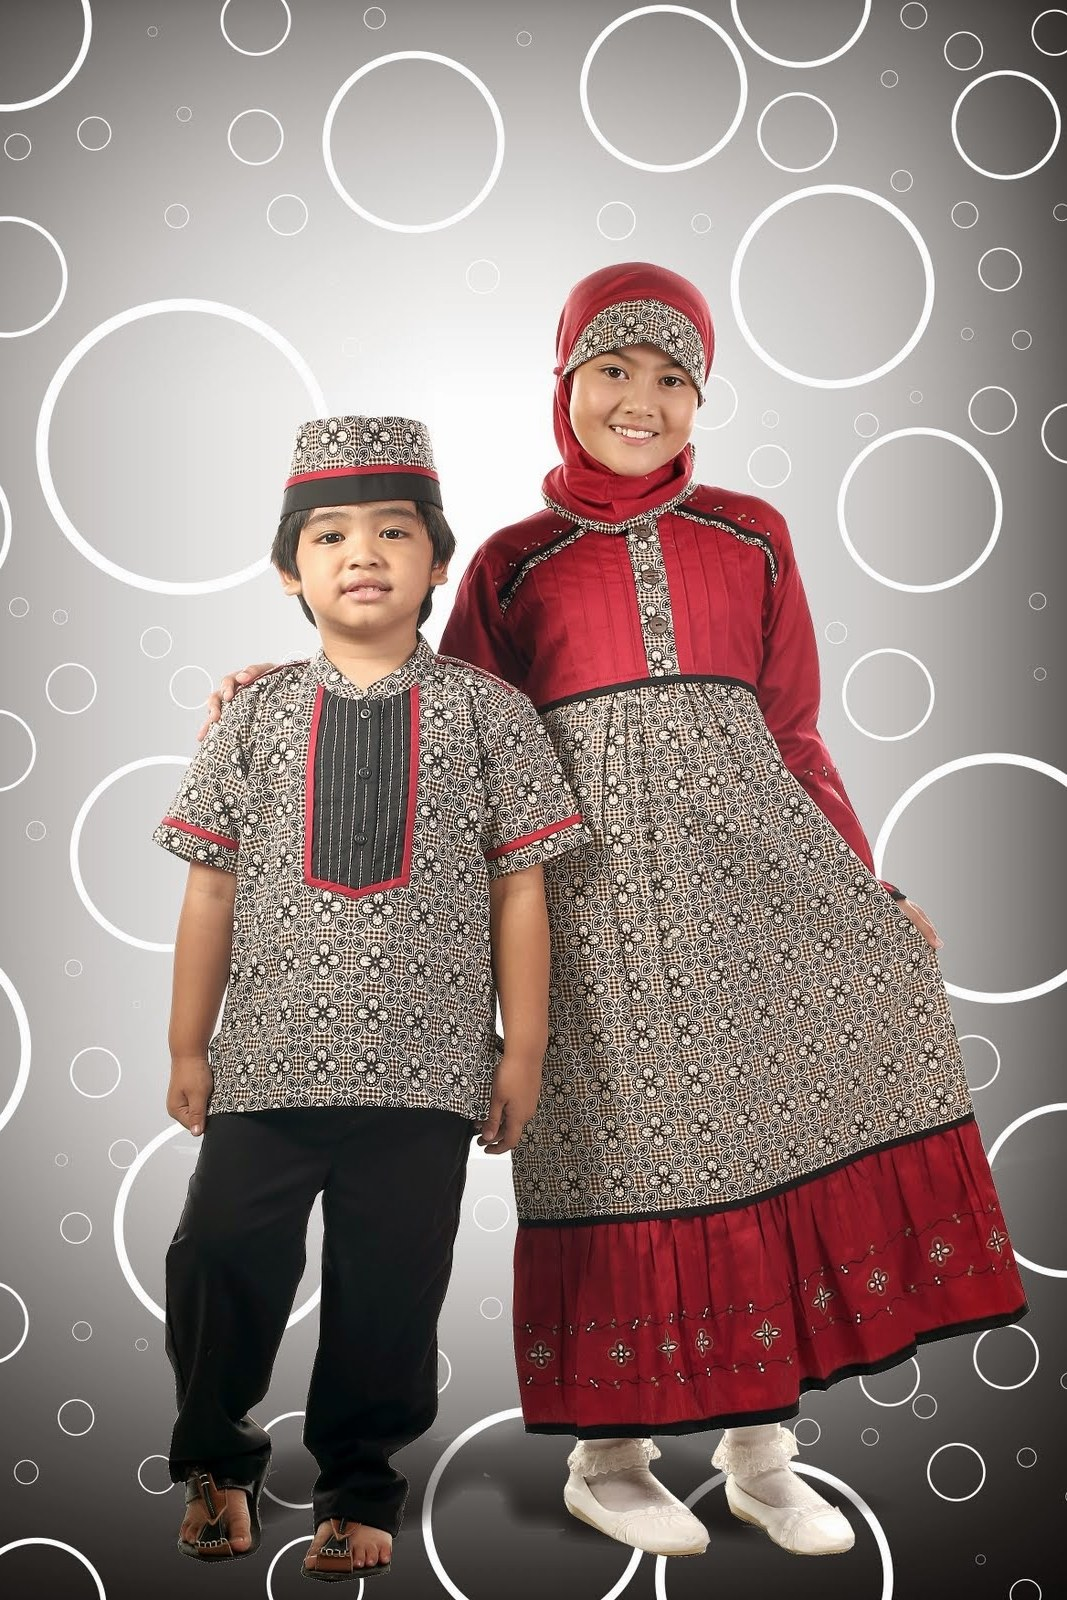 Ide Baju Lebaran Untuk Laki Laki 9fdy Model Baju Batik Muslim Terbaru Untuk Anak Perempuan Dan